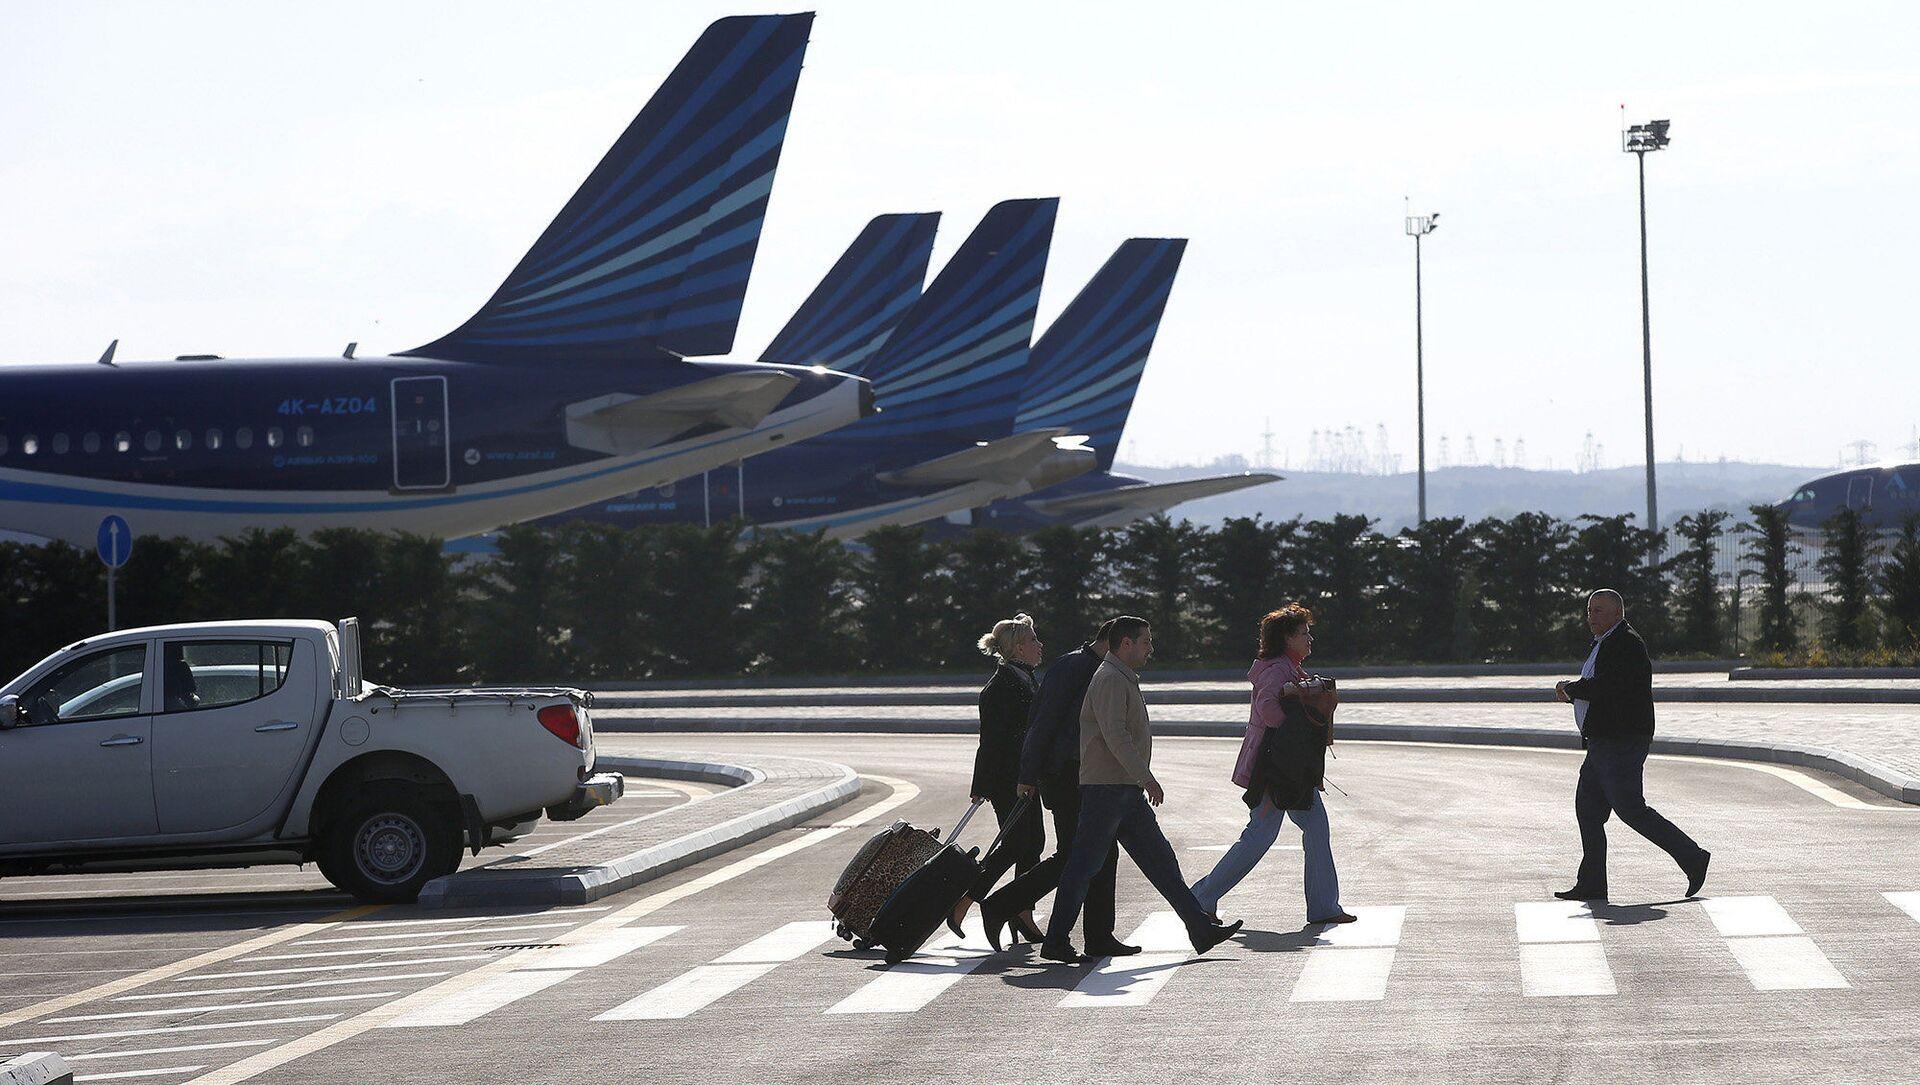 Пассажиры торопятся на рейс в аэропорту Гейдара Алиева - Sputnik Азербайджан, 1920, 10.06.2021